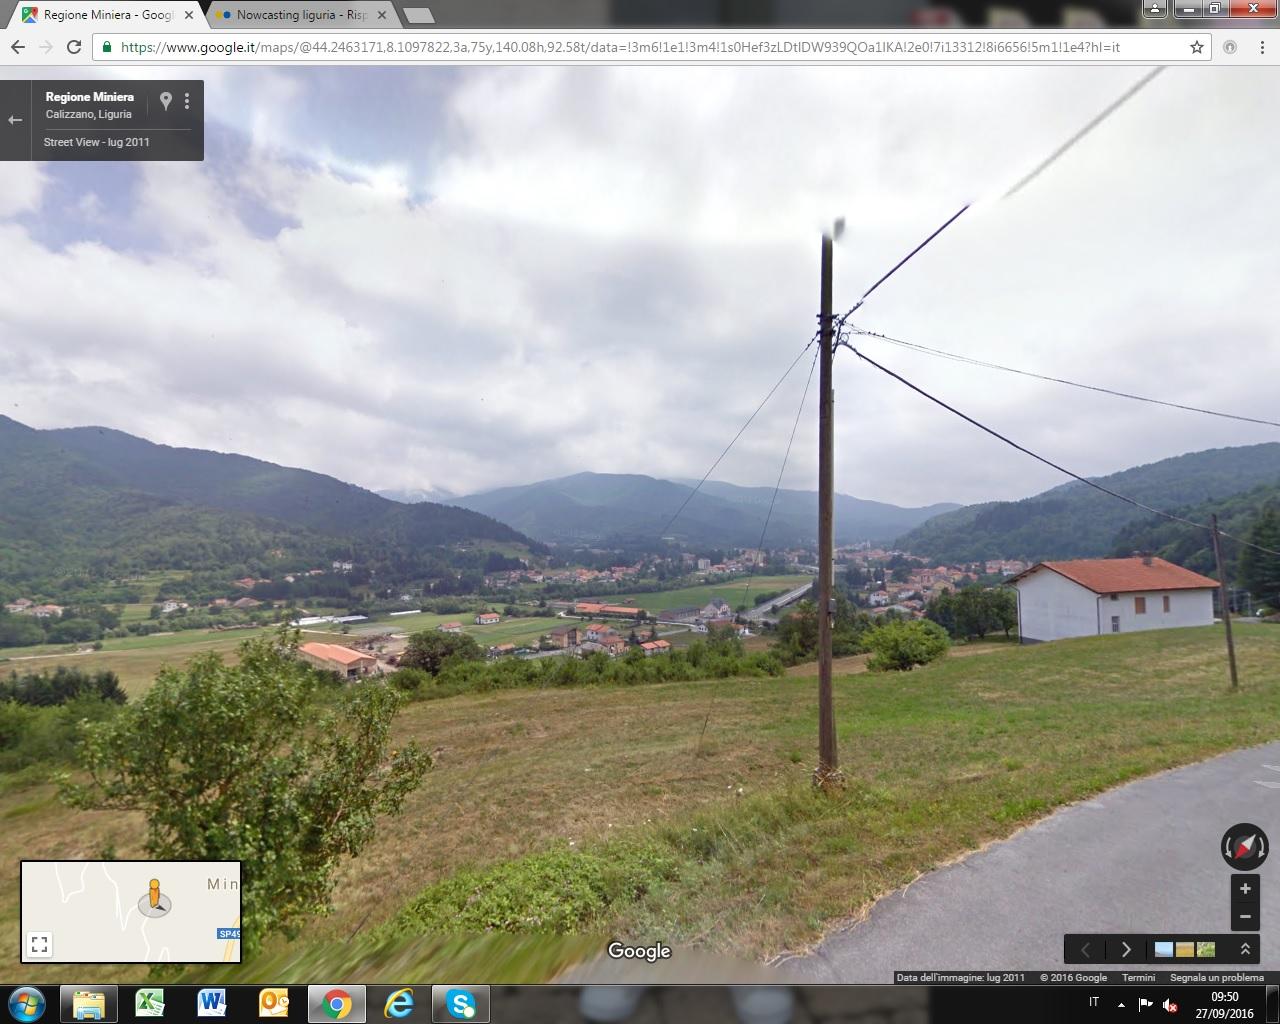 Nowcasting liguria-immc2.jpg